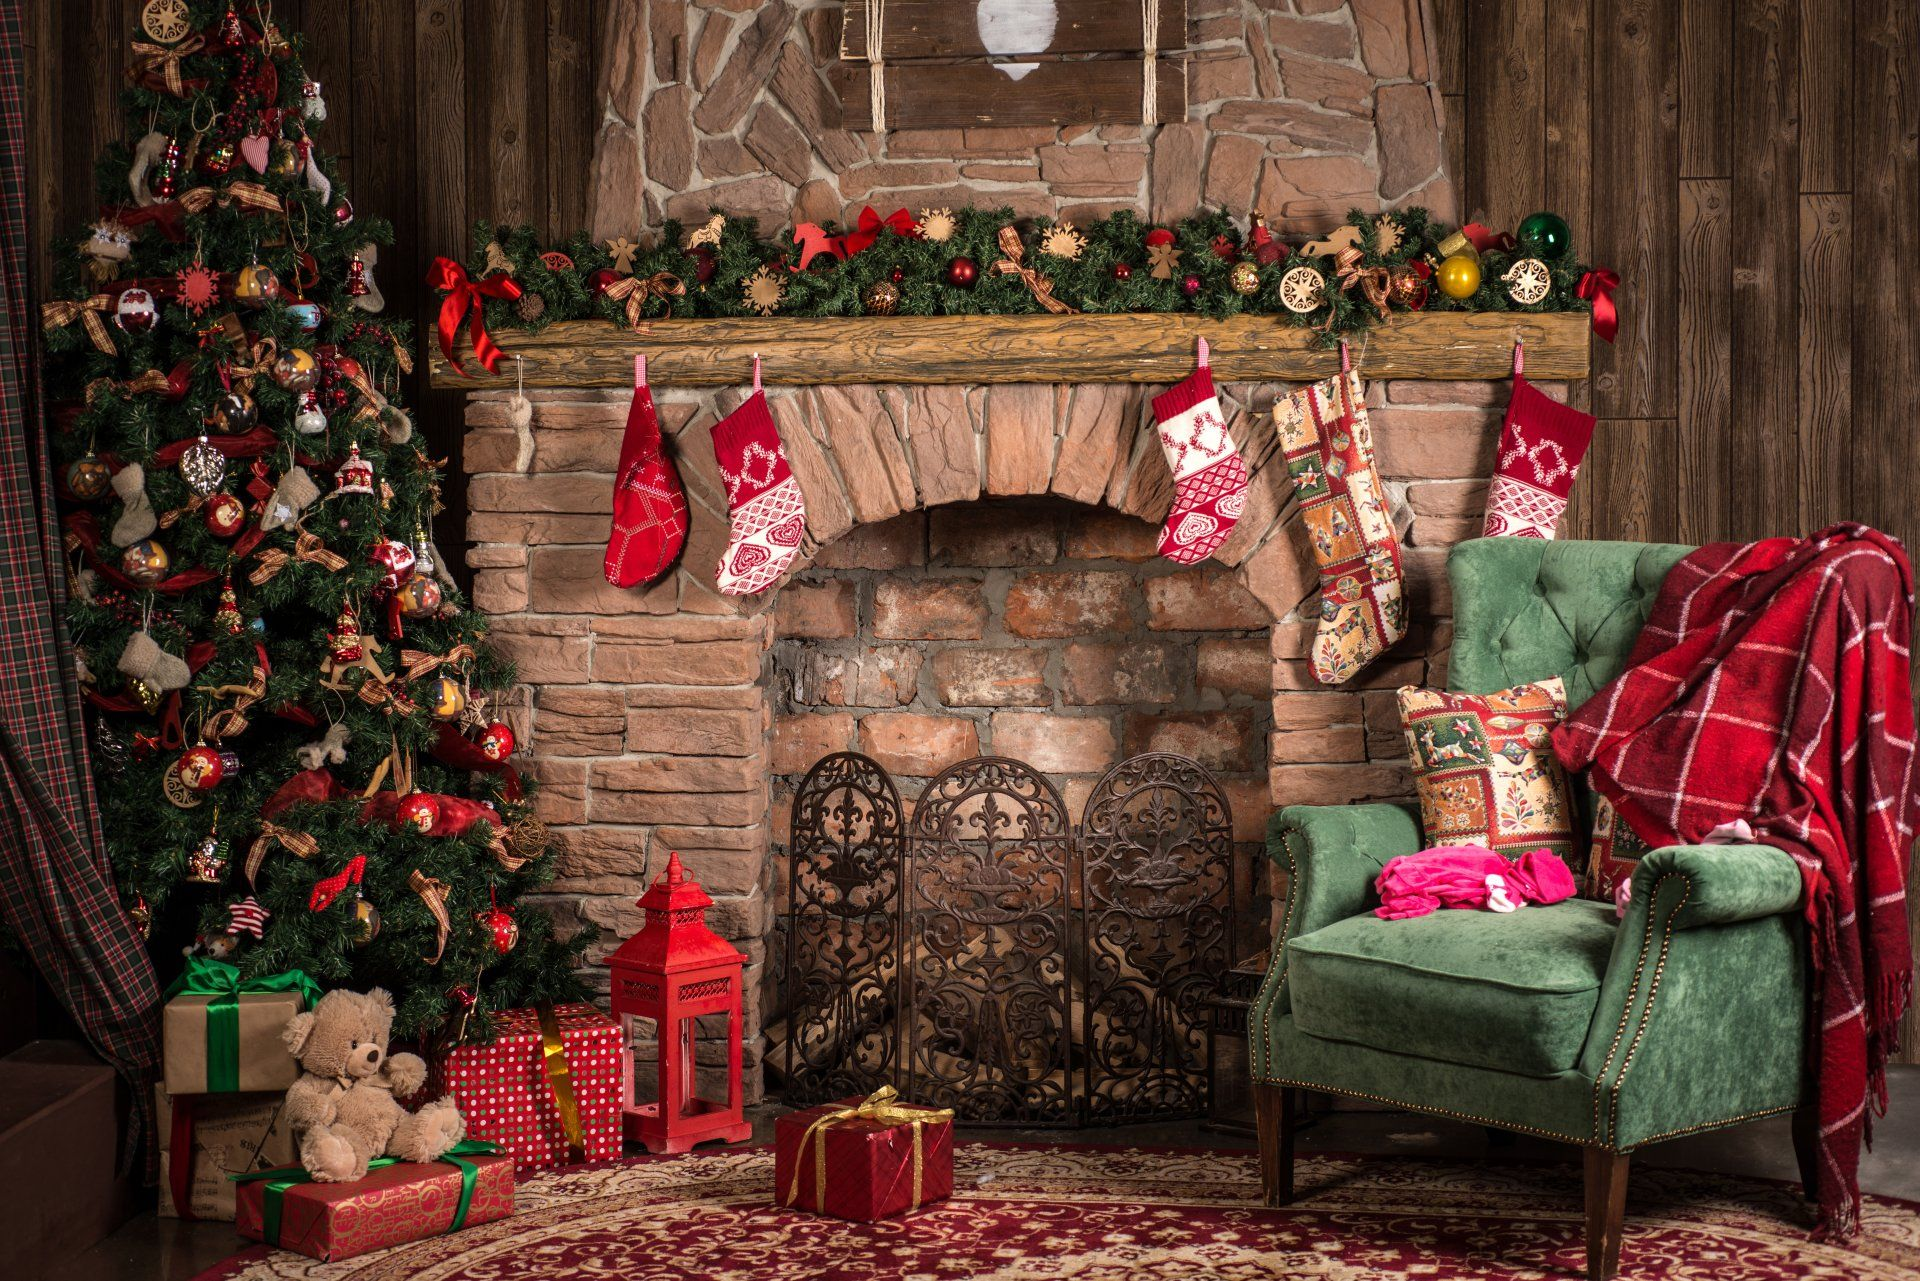 Holiday Christmas Holiday Christmas Tree Living Room Fireplace Christmas Ornaments Stocking Wallpaper Decoracao De